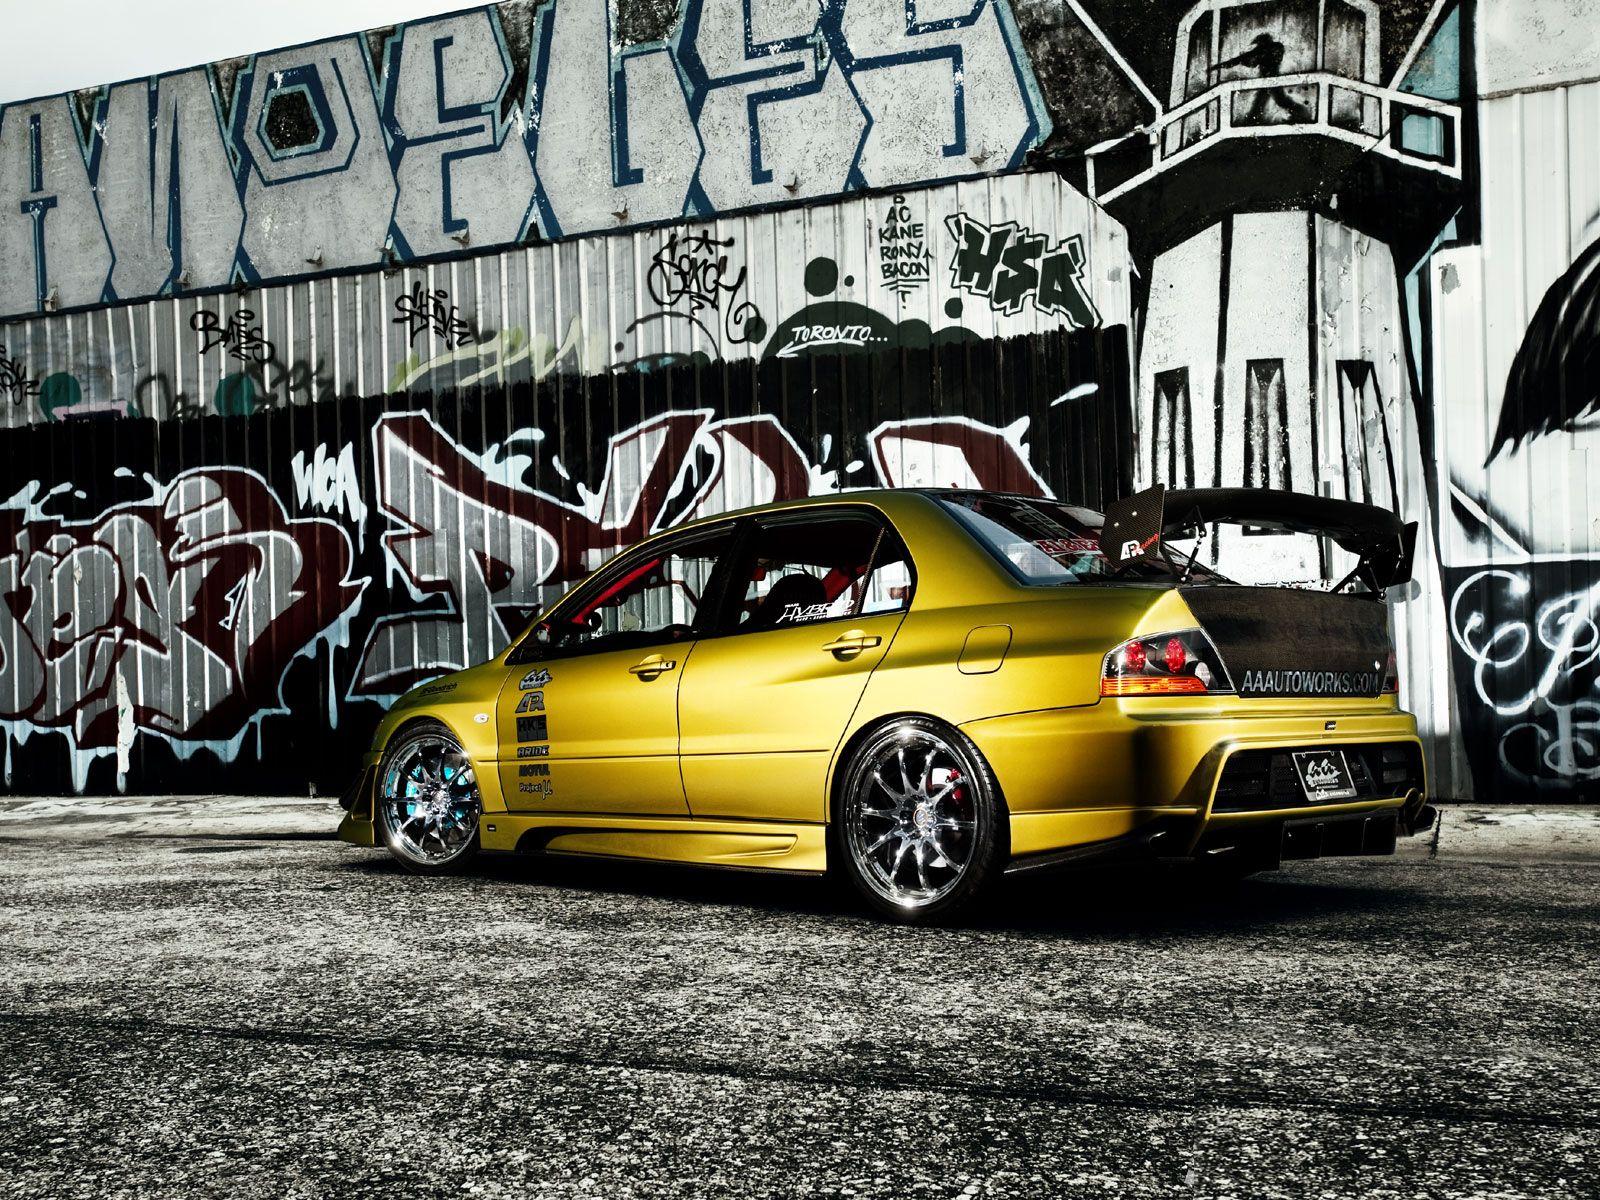 Tuned cars wallpapers 6 tuned cars wallpapers pinterest car tuning wallpaper and wallpapers android